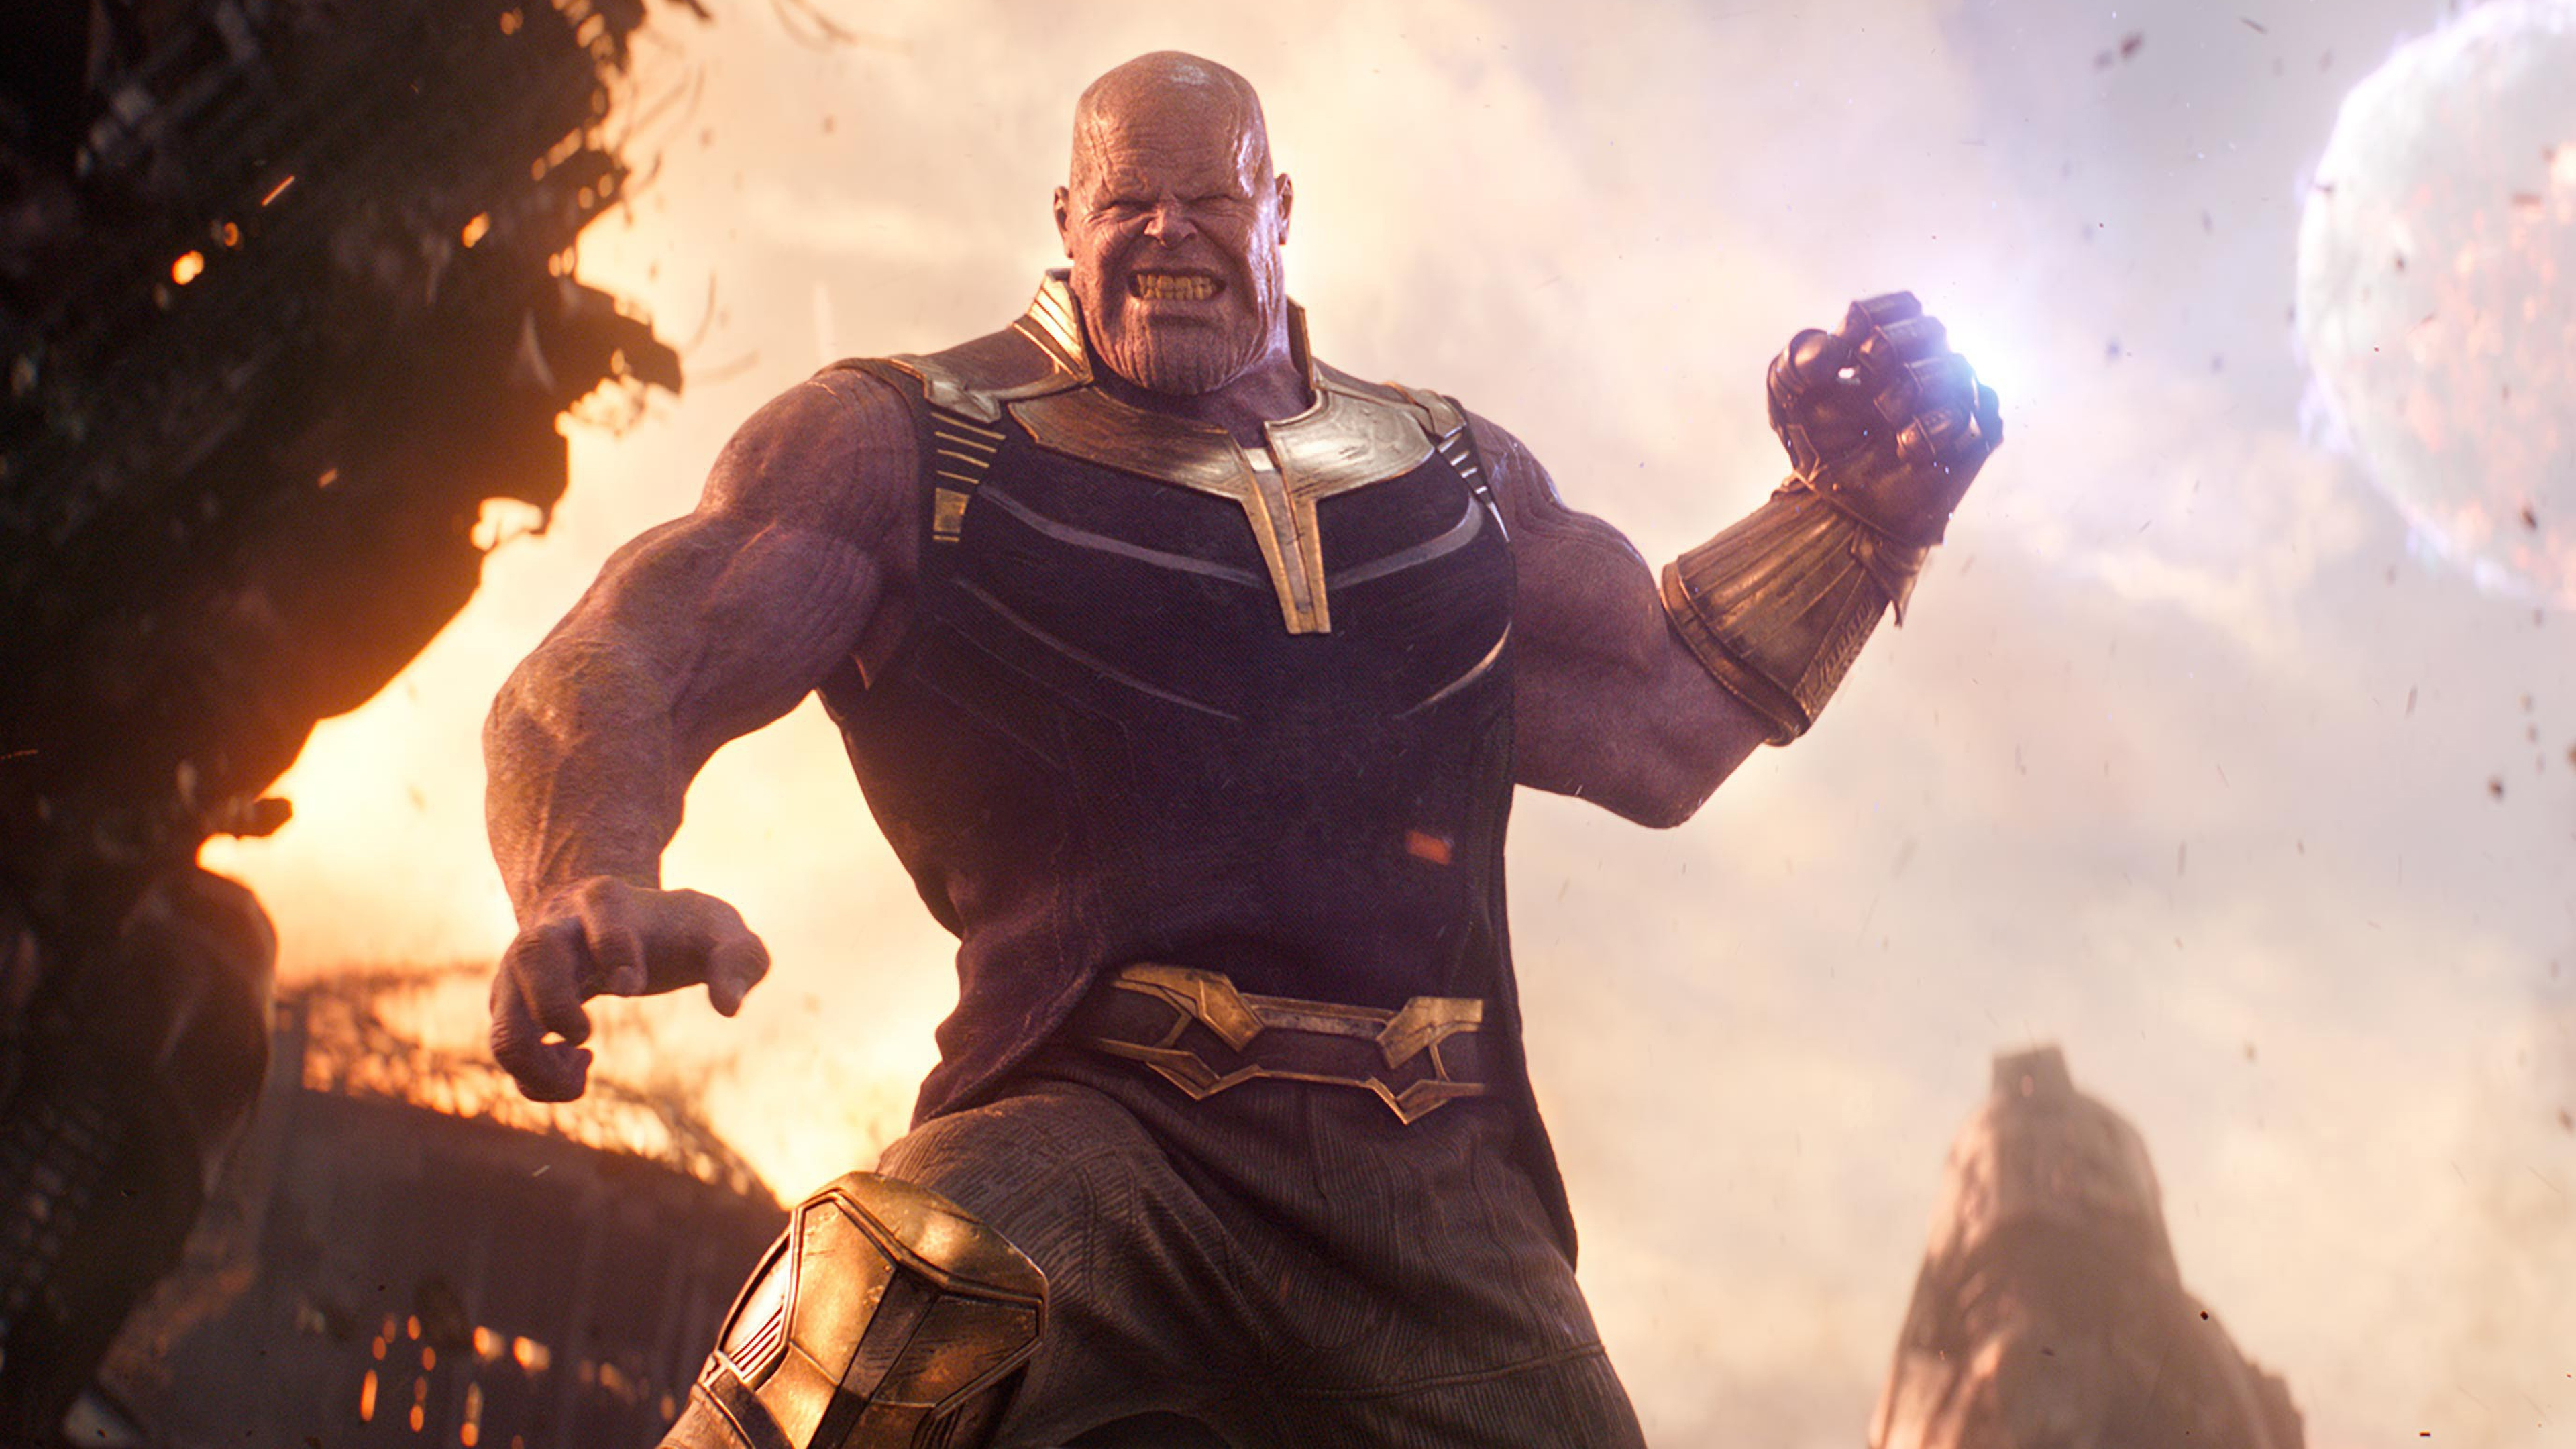 thanos infinity gauntlet avengers infinity war 4k 1547507333 - Thanos Infinity Gauntlet Avengers: Infinity War 4K - Thanos, Avengers Infinity War